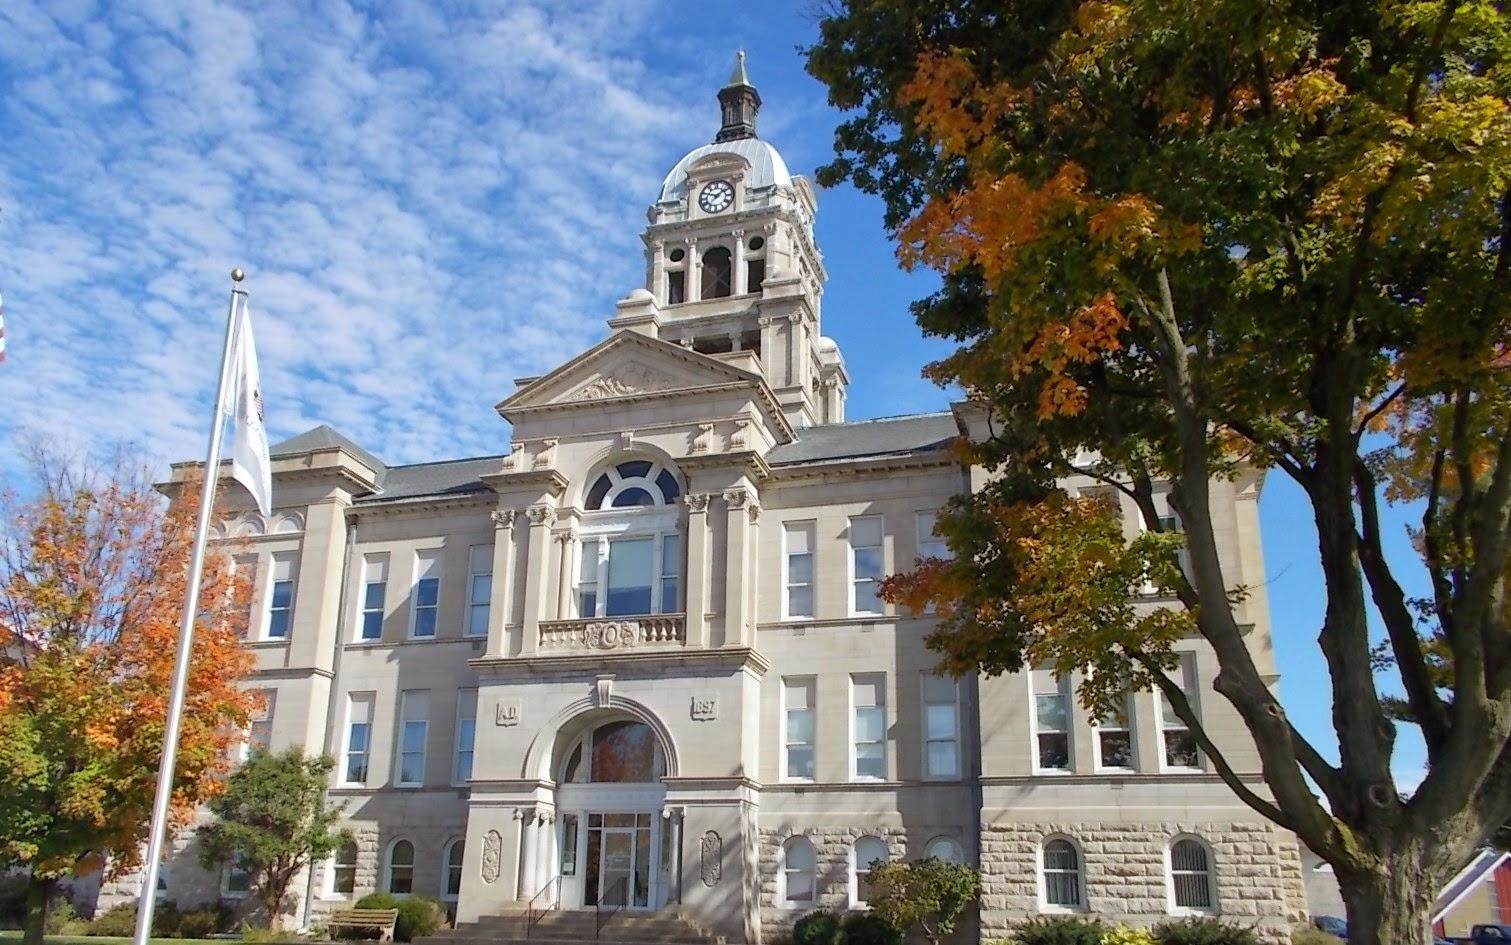 Illinois woodford county metamora - Tuesday February 24 2015